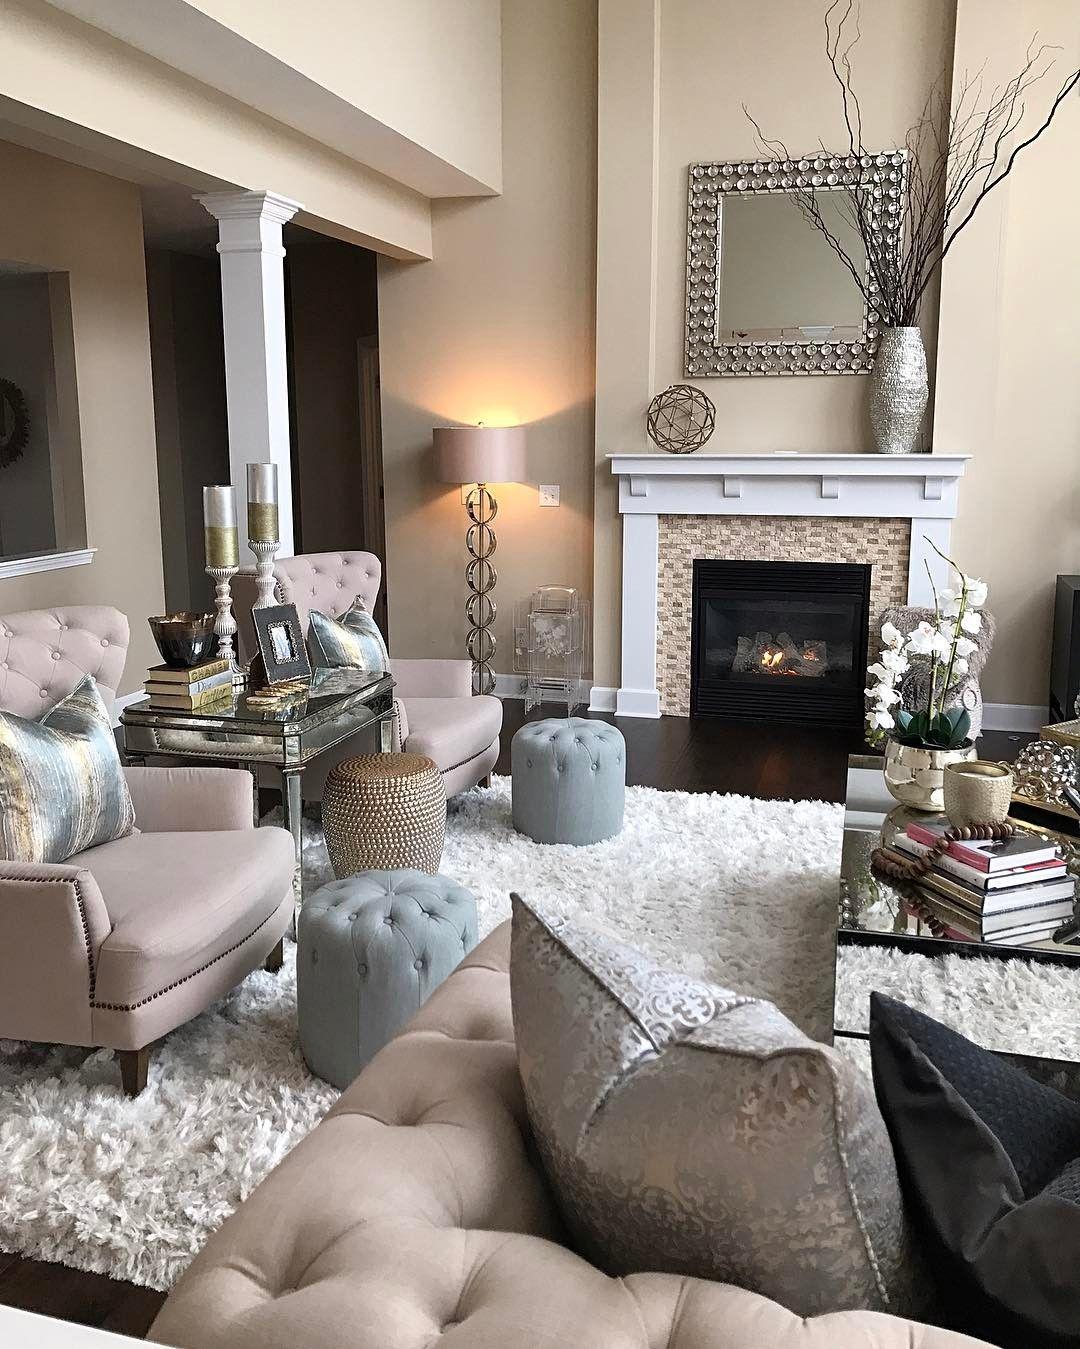 Home interior angles k likes  comments  interior design u home decor